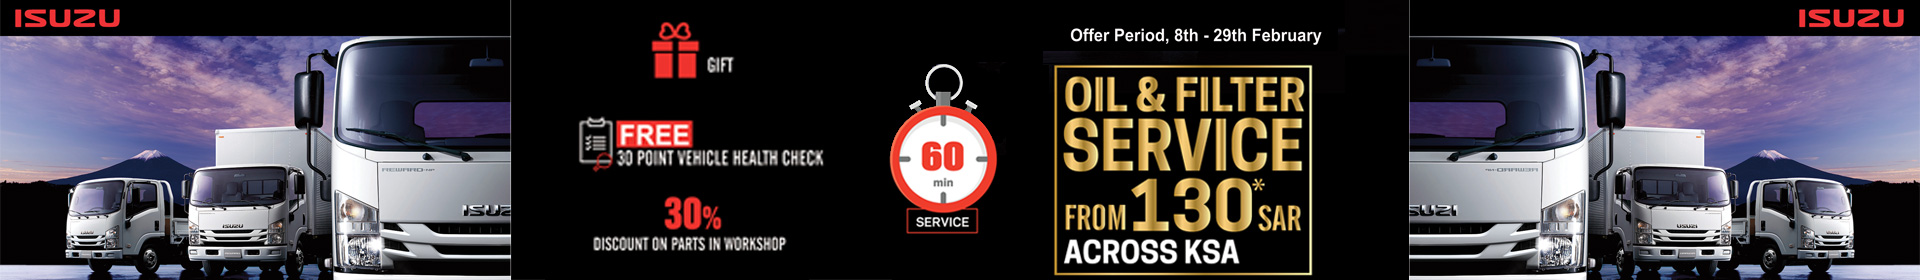 Isuzu 60 min Service with Competitive Price in KSA